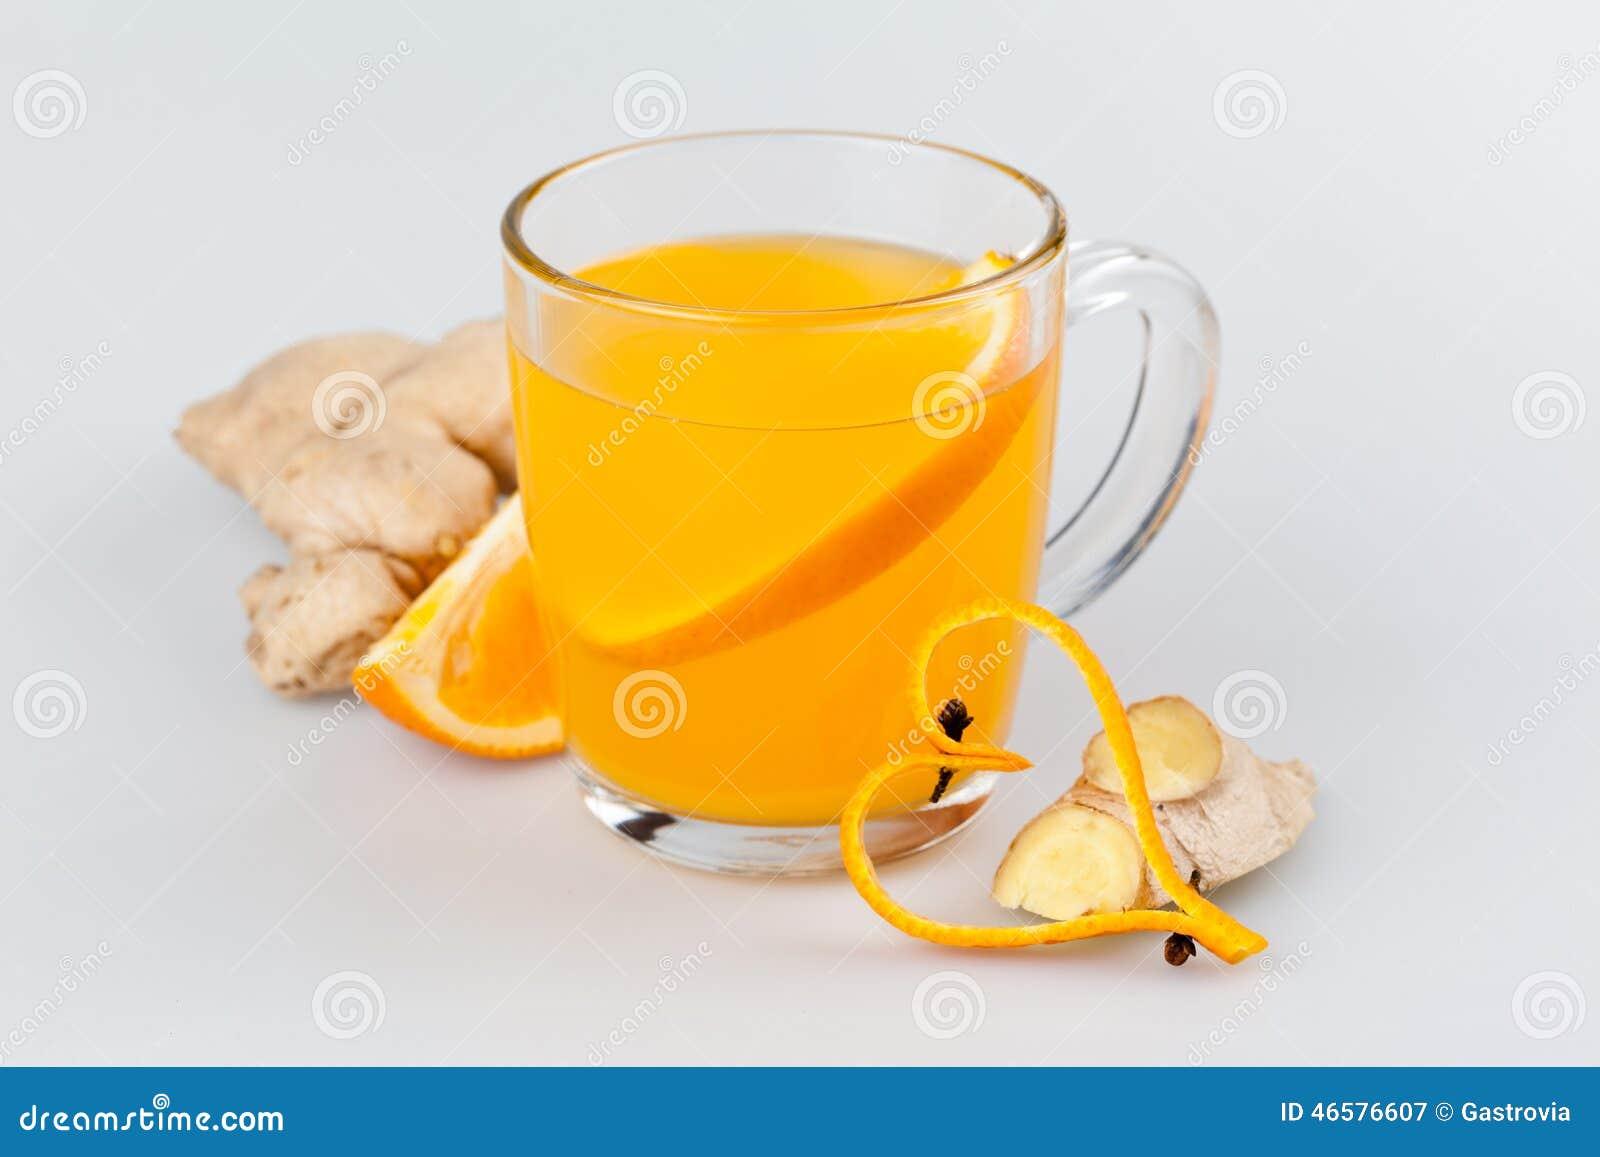 Boisson chaude de gingembre orange